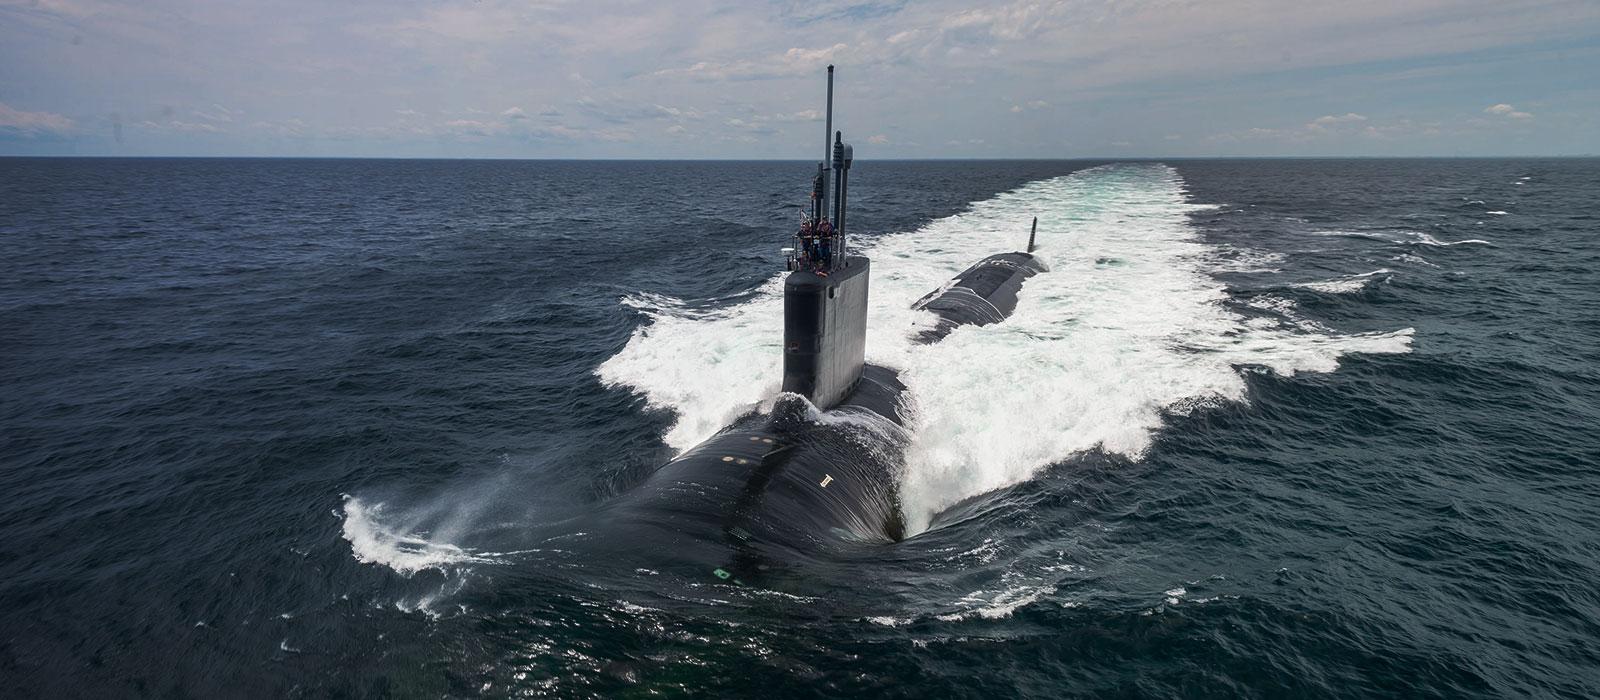 Submarine USS John Warner (SSN 785) half-submerged in the ocean